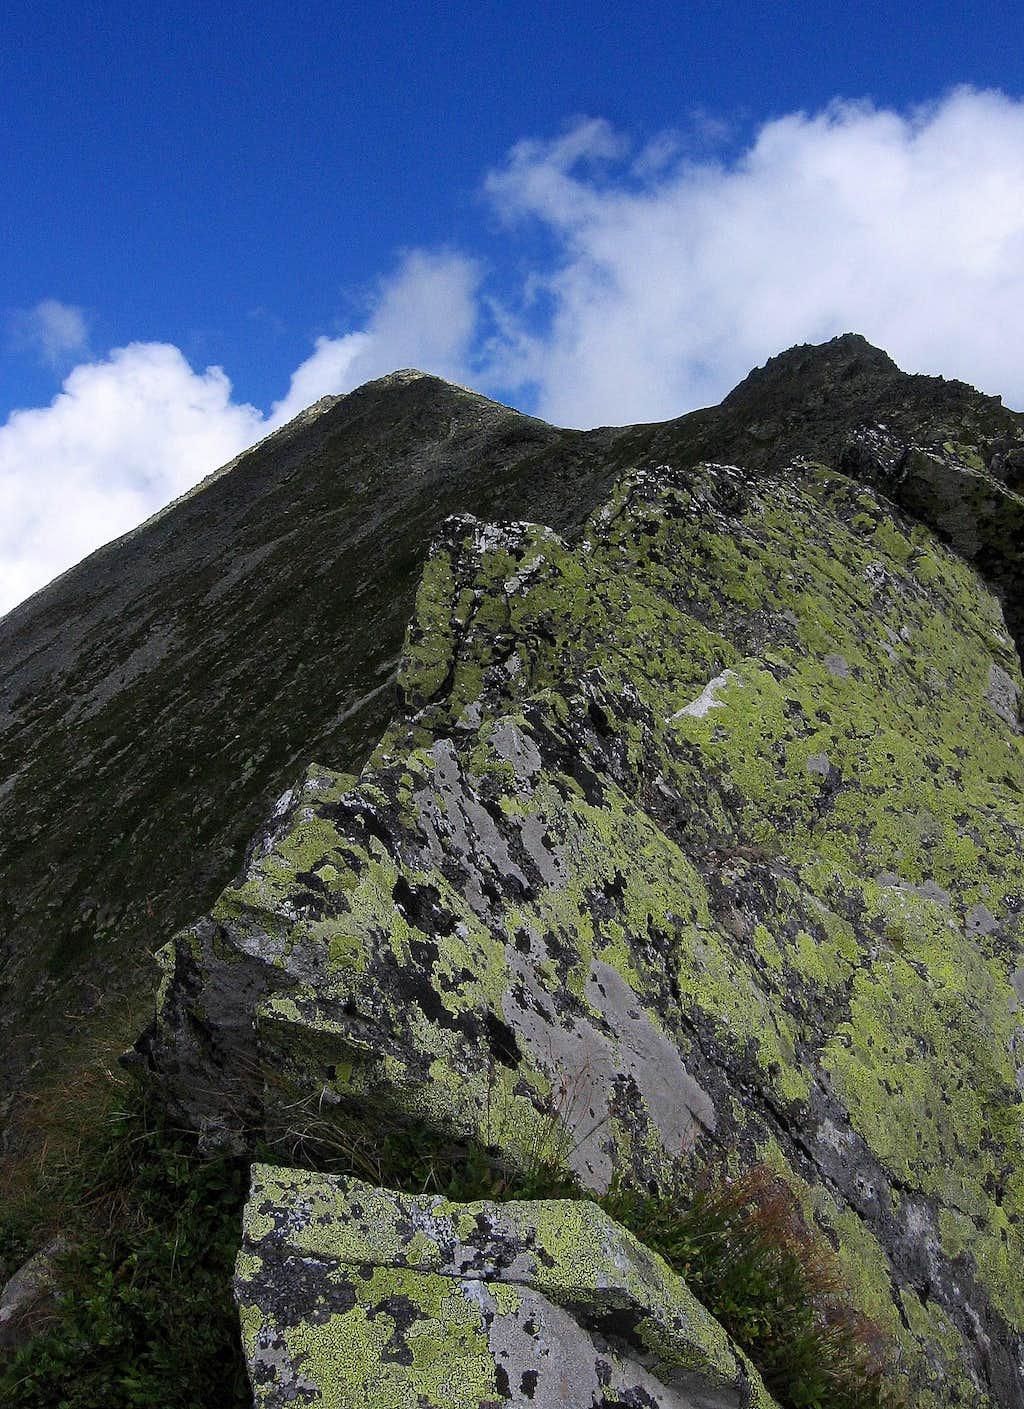 Detail from Porţile Închise (Closed gates) and Vârful (Peak) Mare